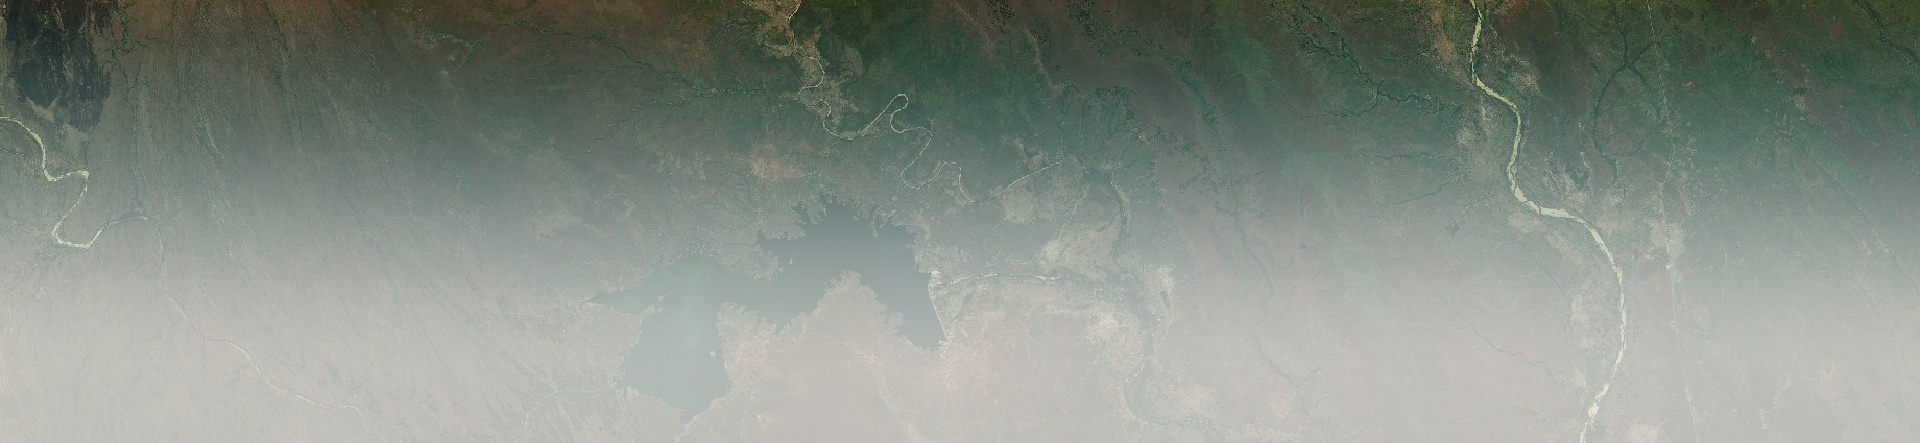 Land in Focus – Basics of Remote Sensing